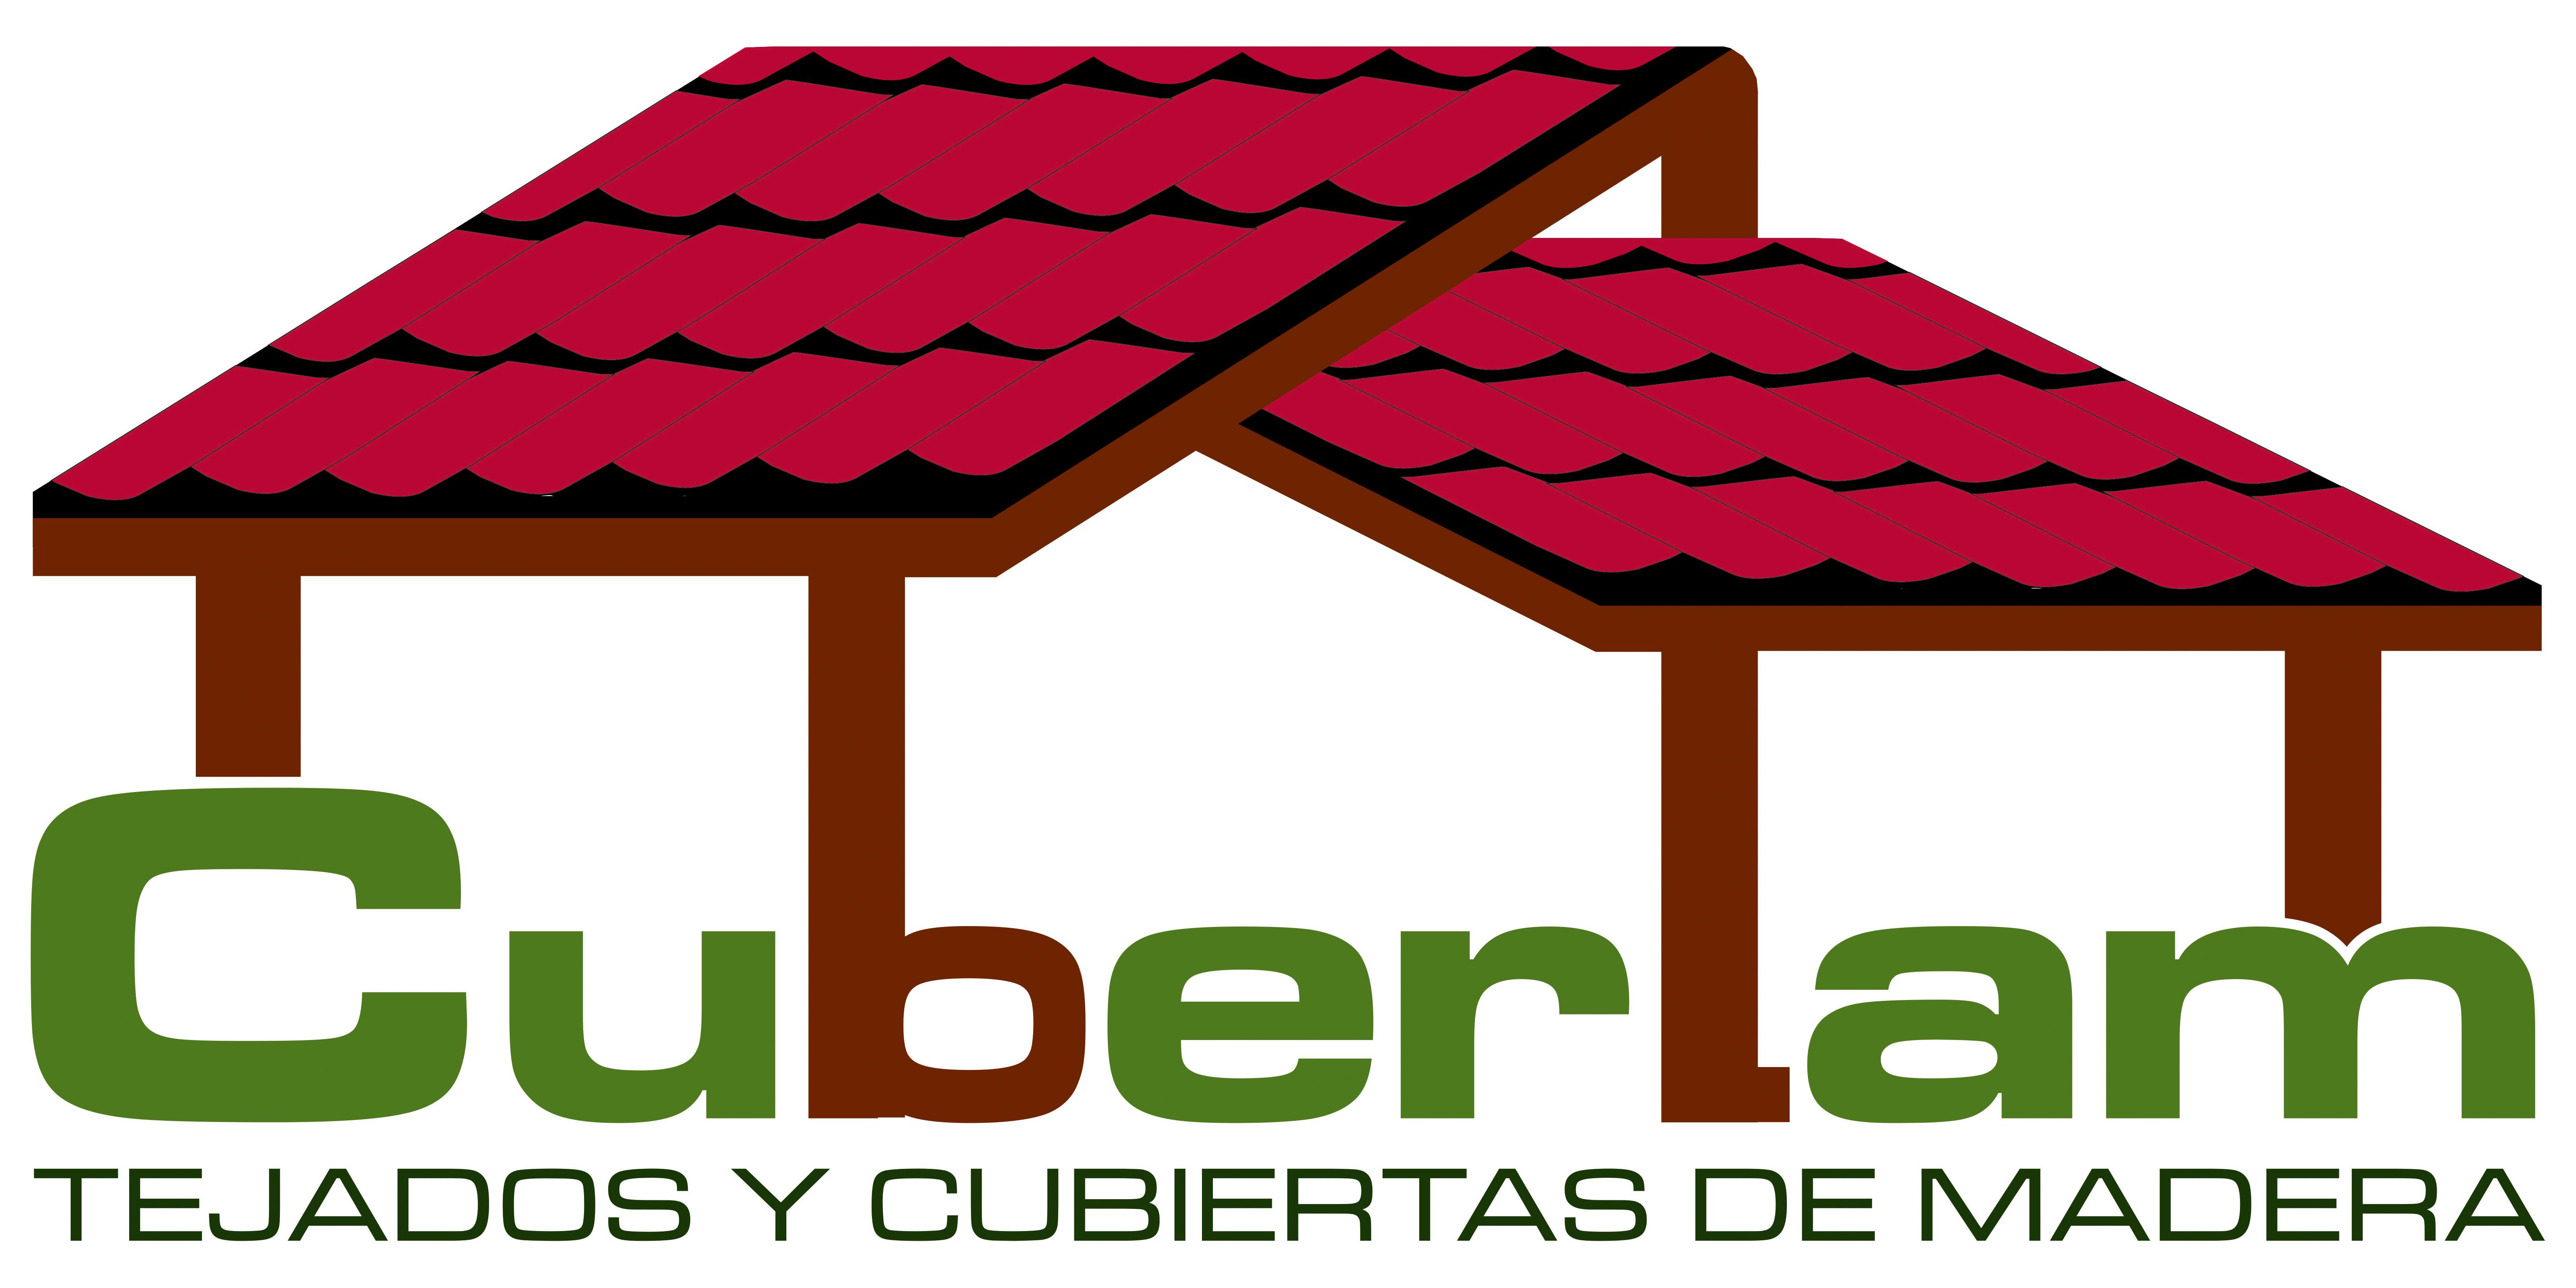 Cubiertas De Madera Cuberlam